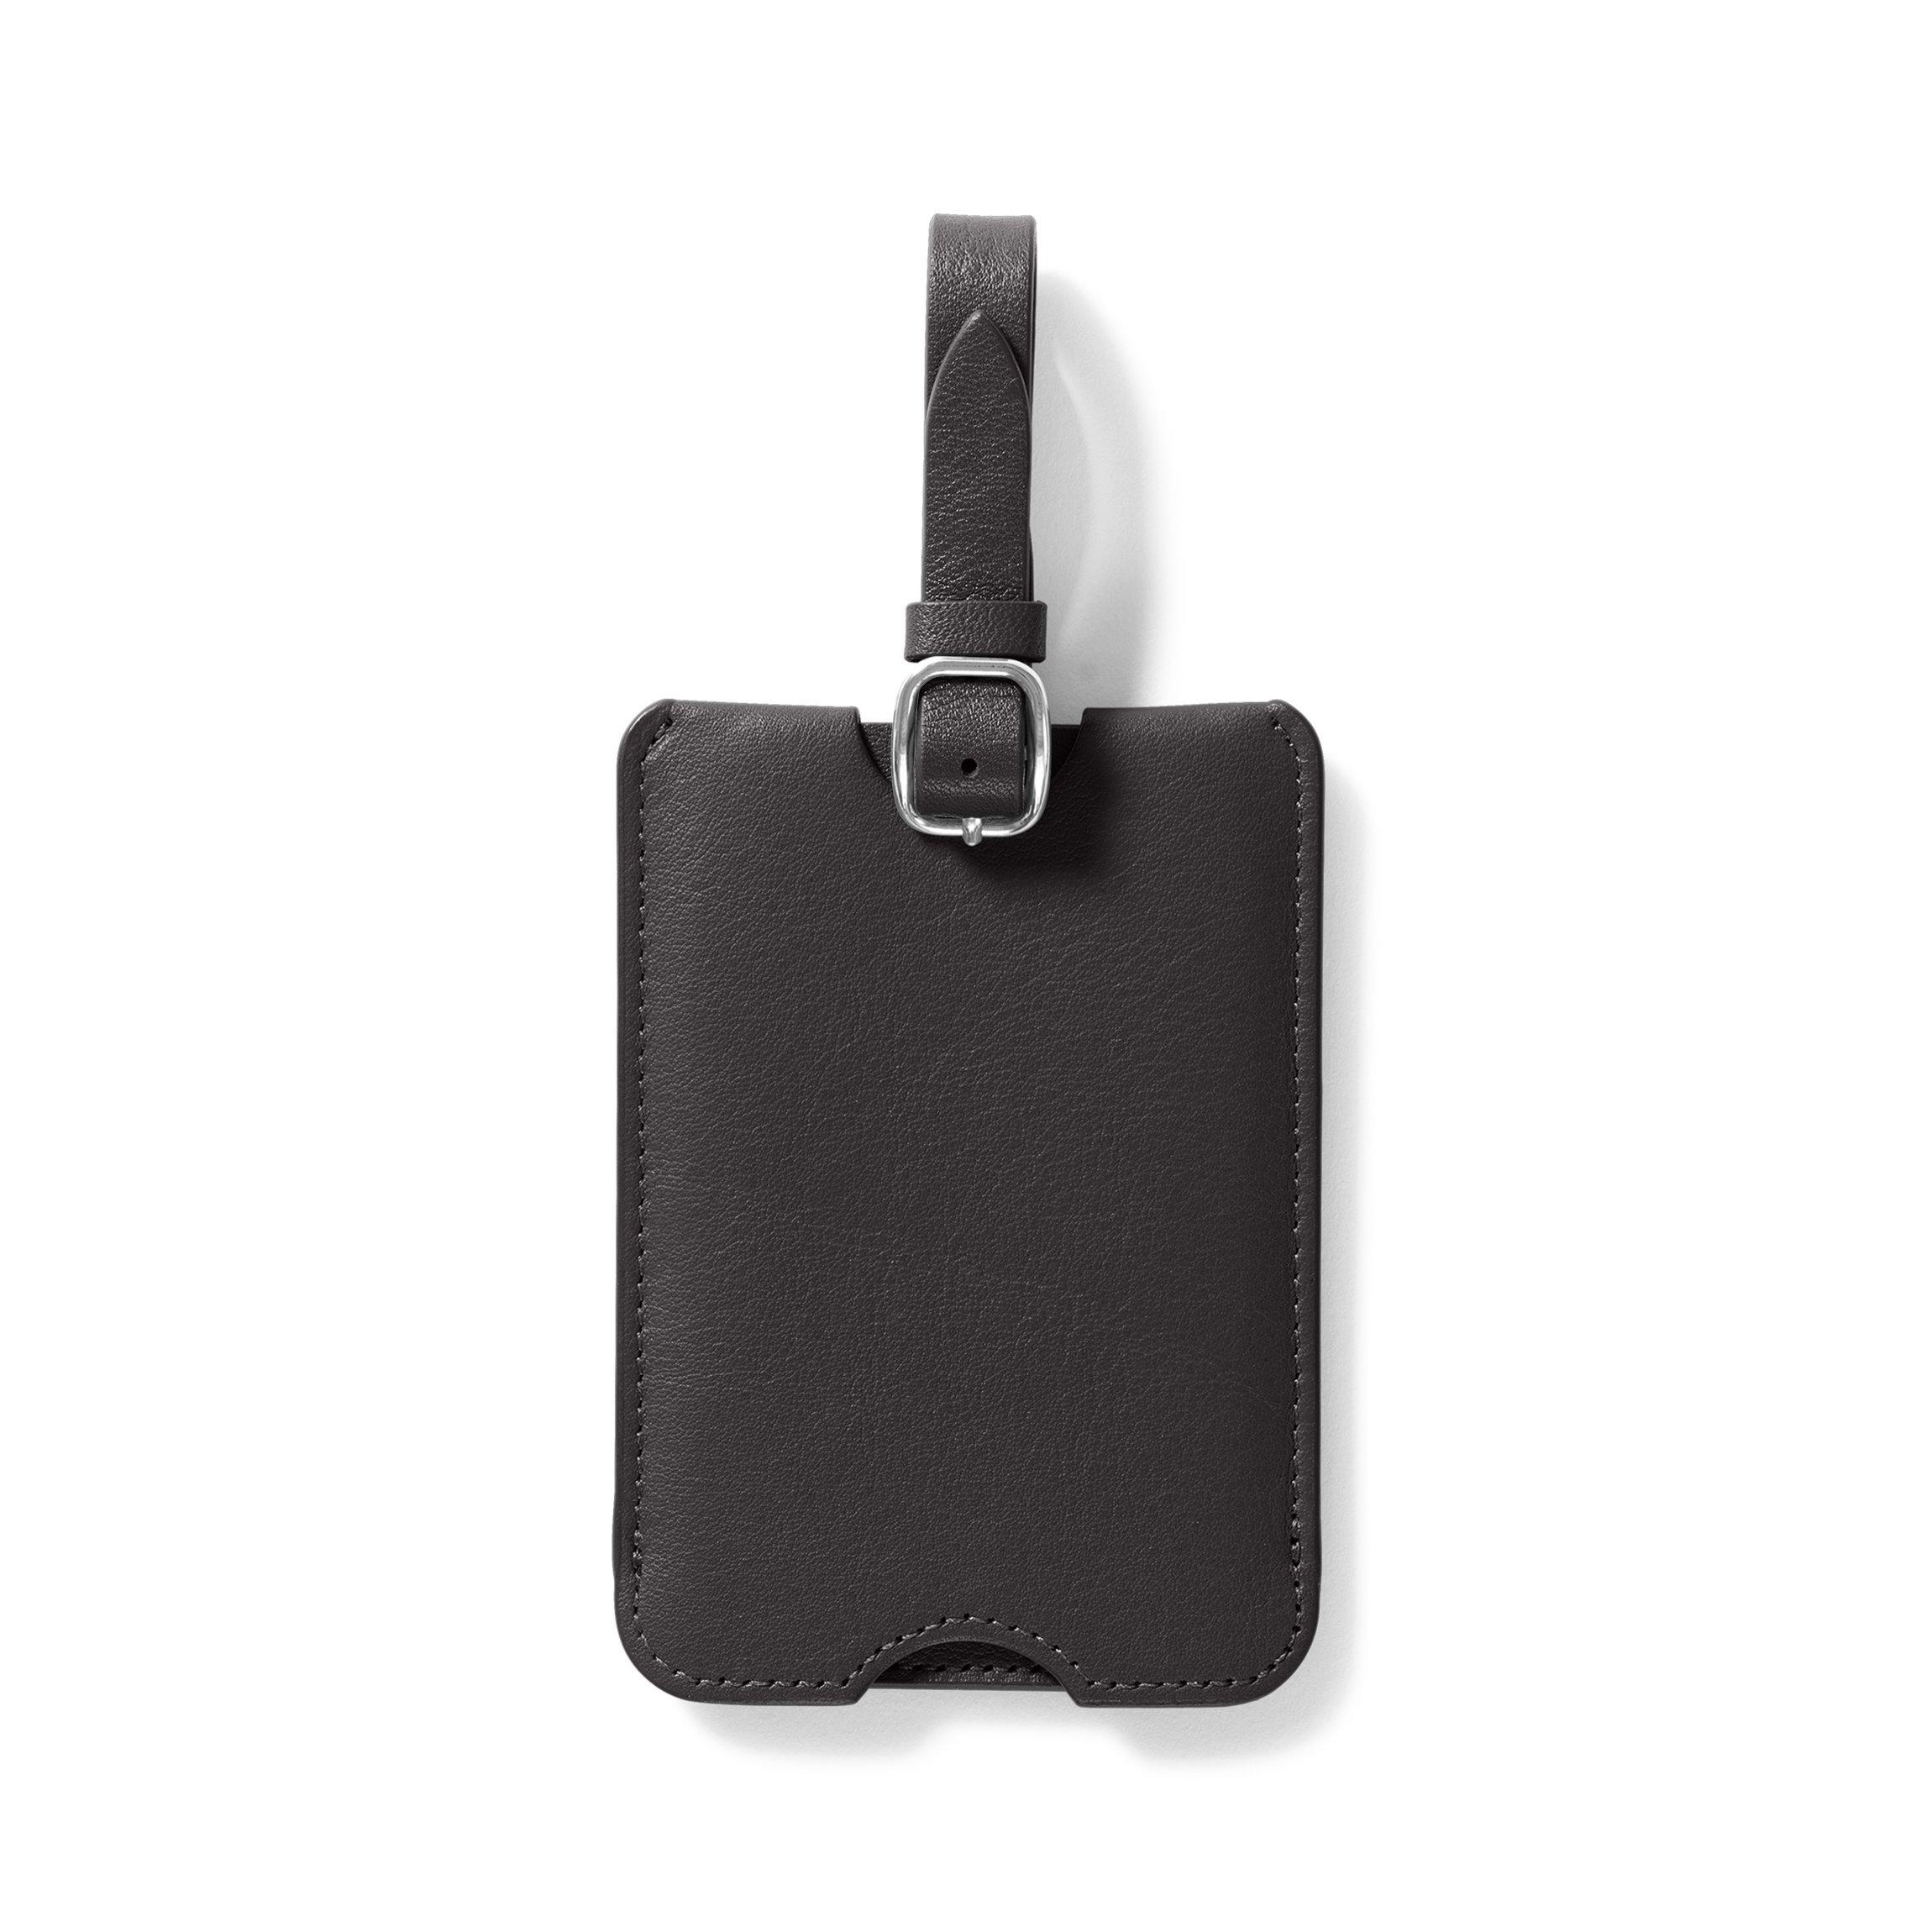 Leatherology Black Onyx Deluxe Luggage Tag by Leatherology